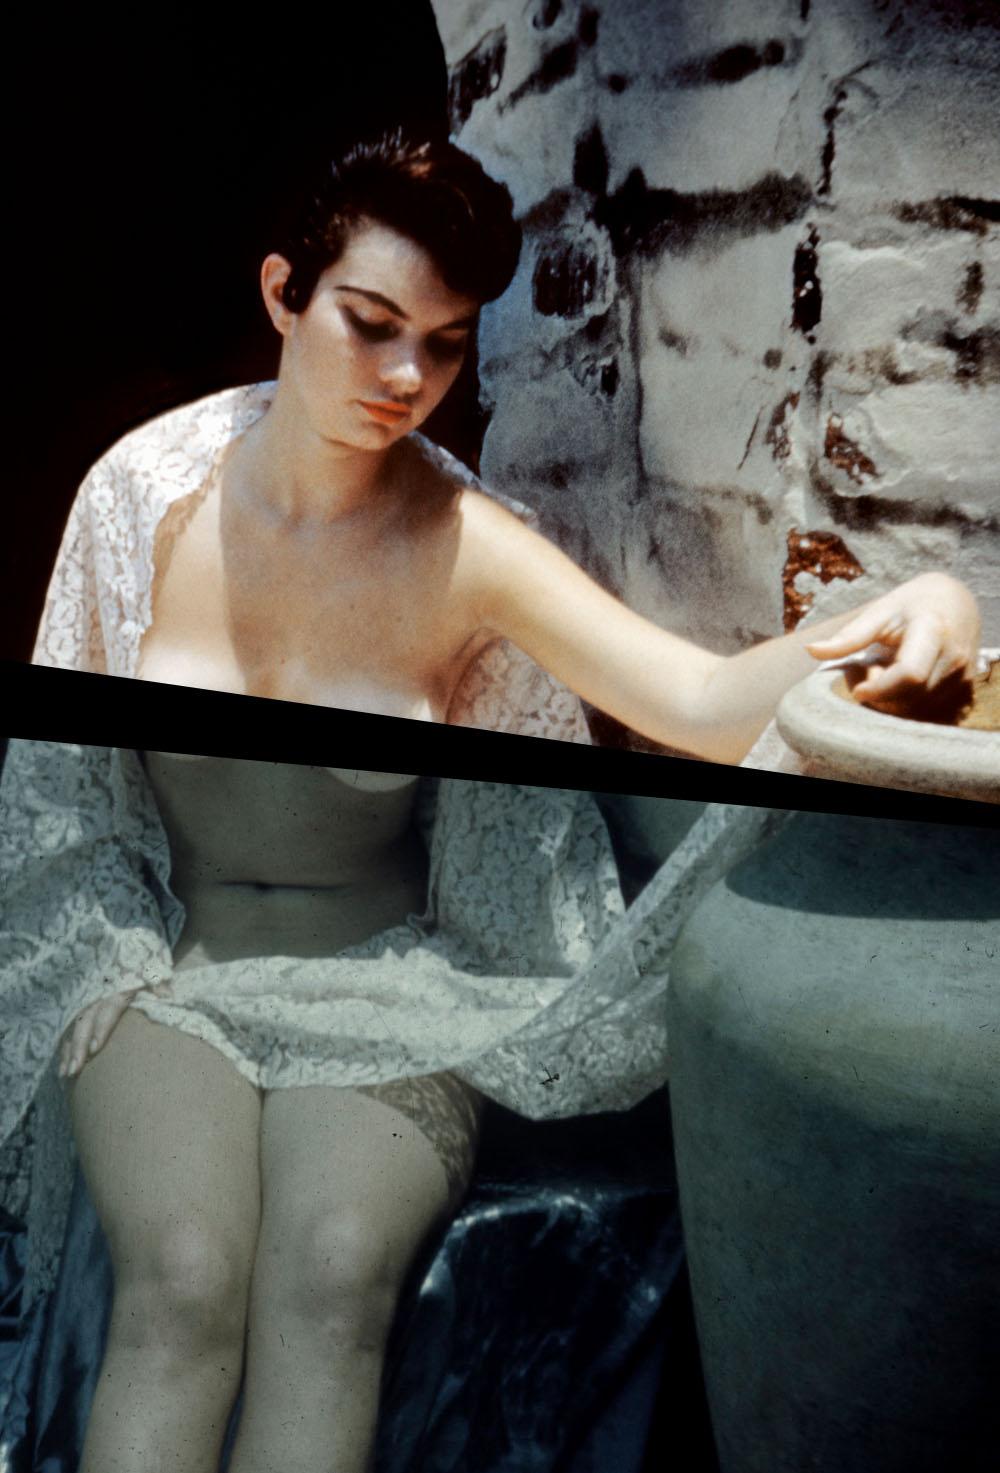 1950s-era amateur nude of a topless woman posing beside an urn.